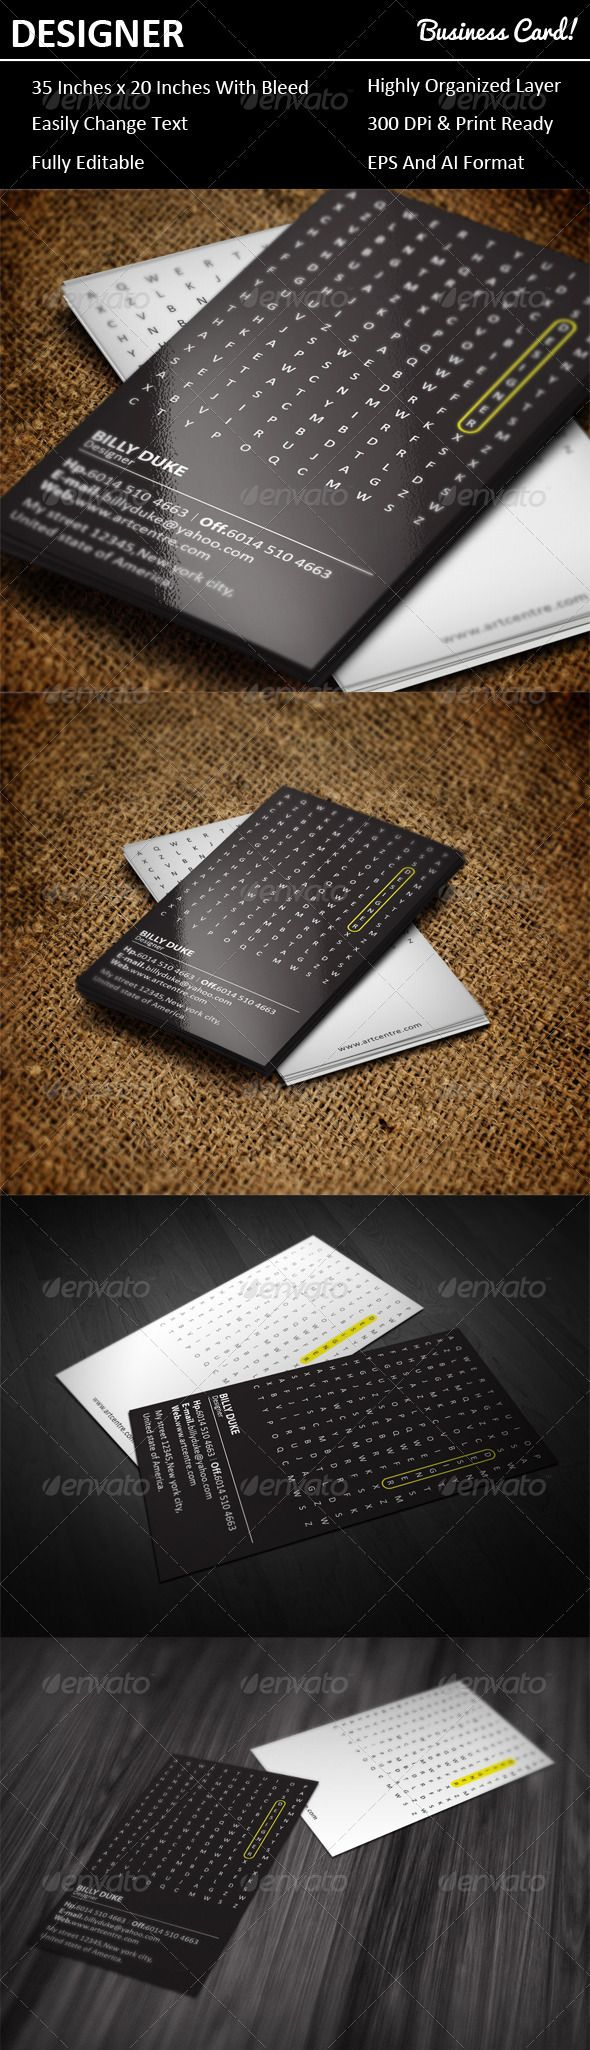 Best Business Card Designs Images On Pinterest Business Card - 2 x 35 business card template